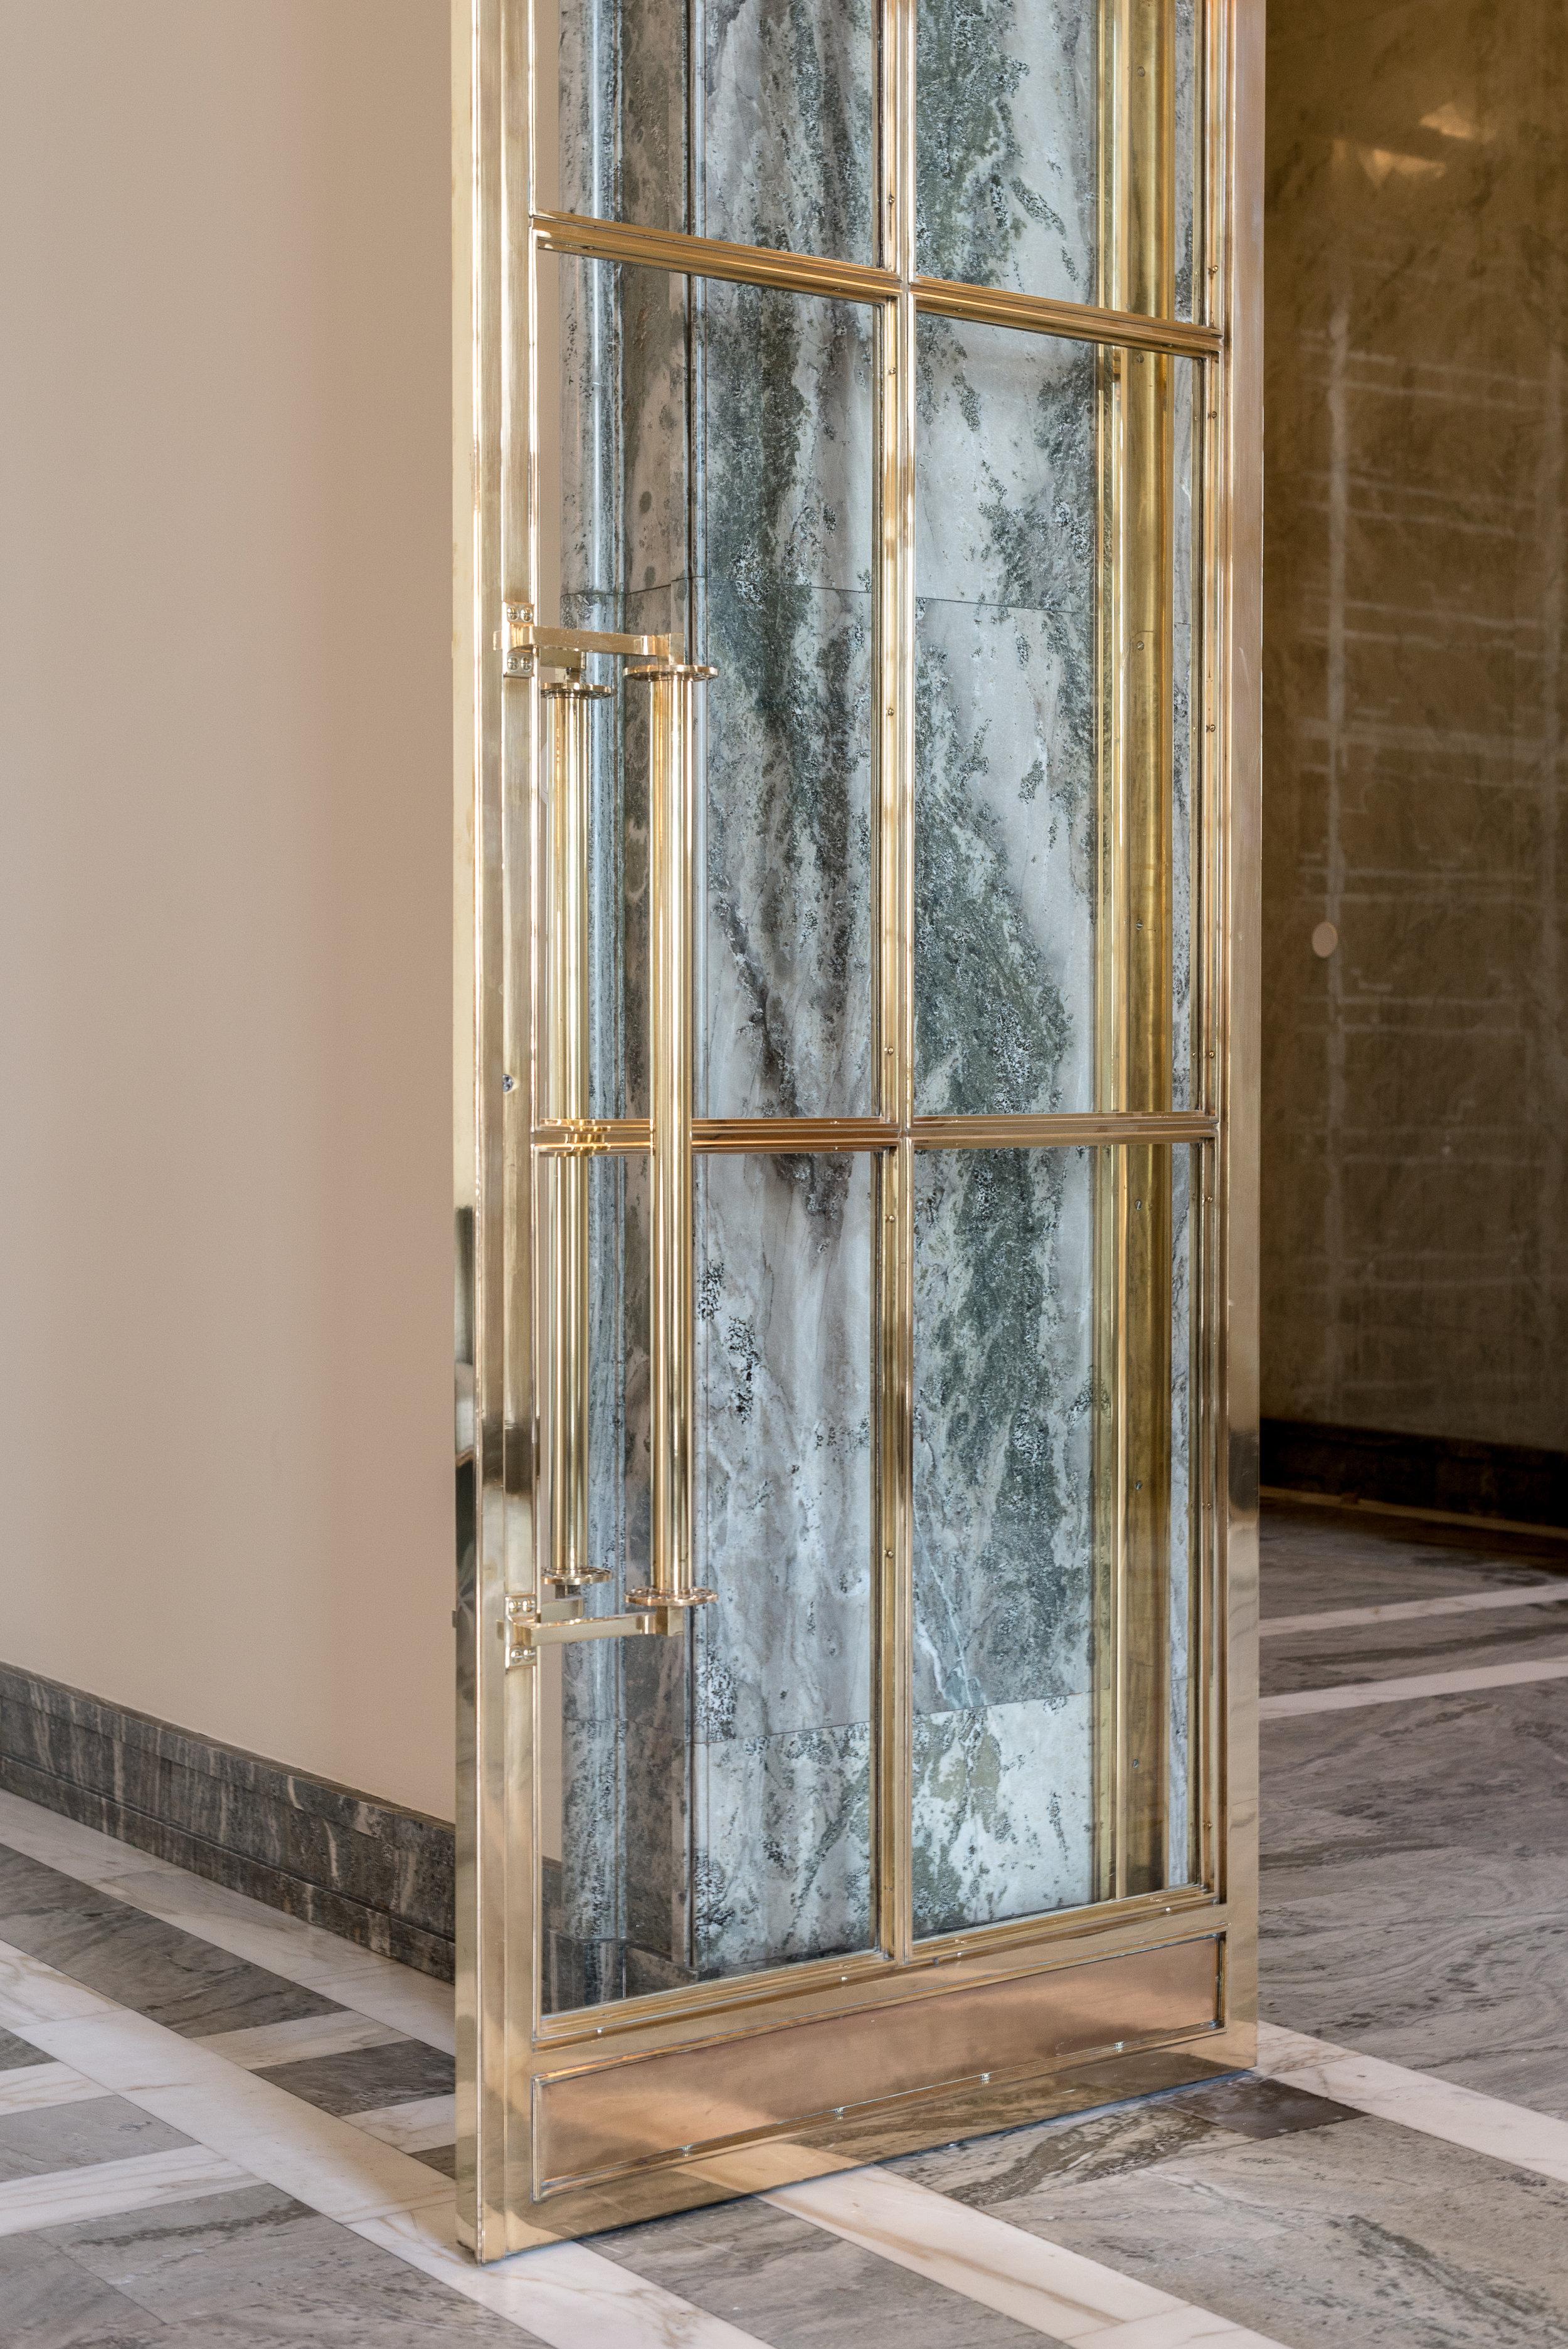 The hall of state (valtiosali) door detail.